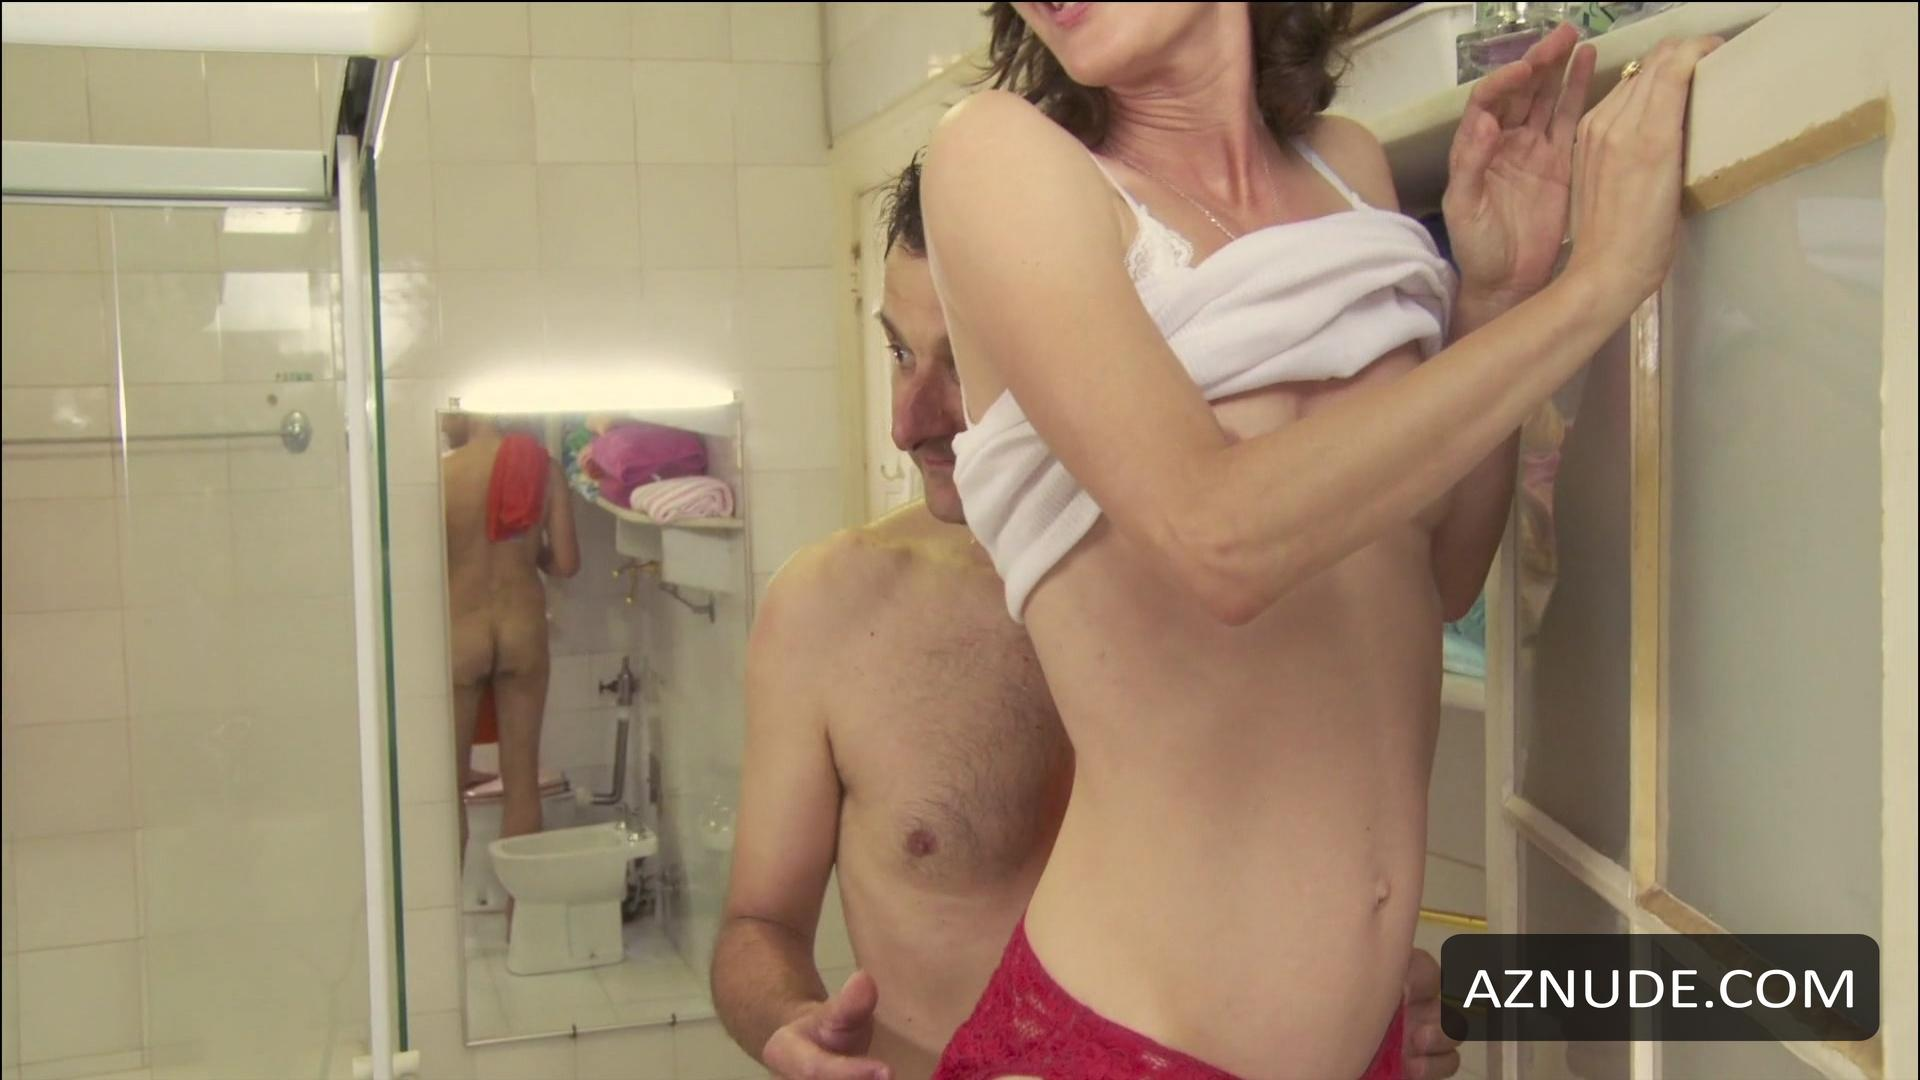 Rio Sex Comedy Nude Scenes - Aznude Men-4964